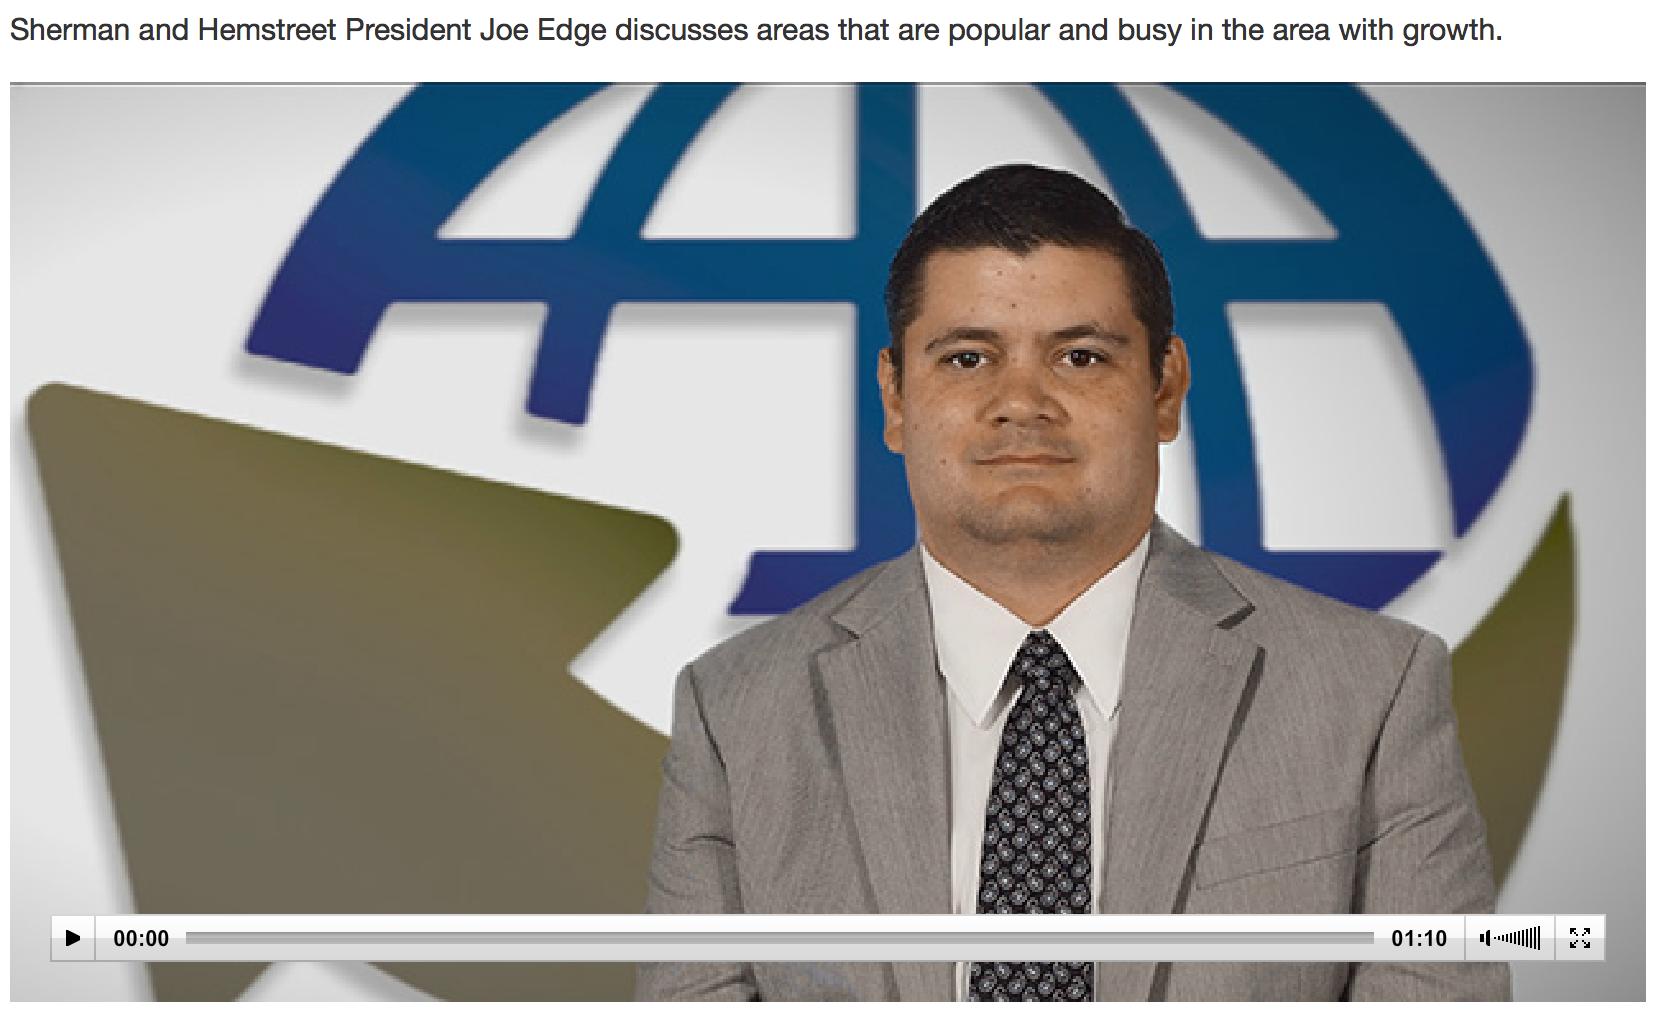 Joe Edge hot areas AUG CEO | Sherman and Hemstreet